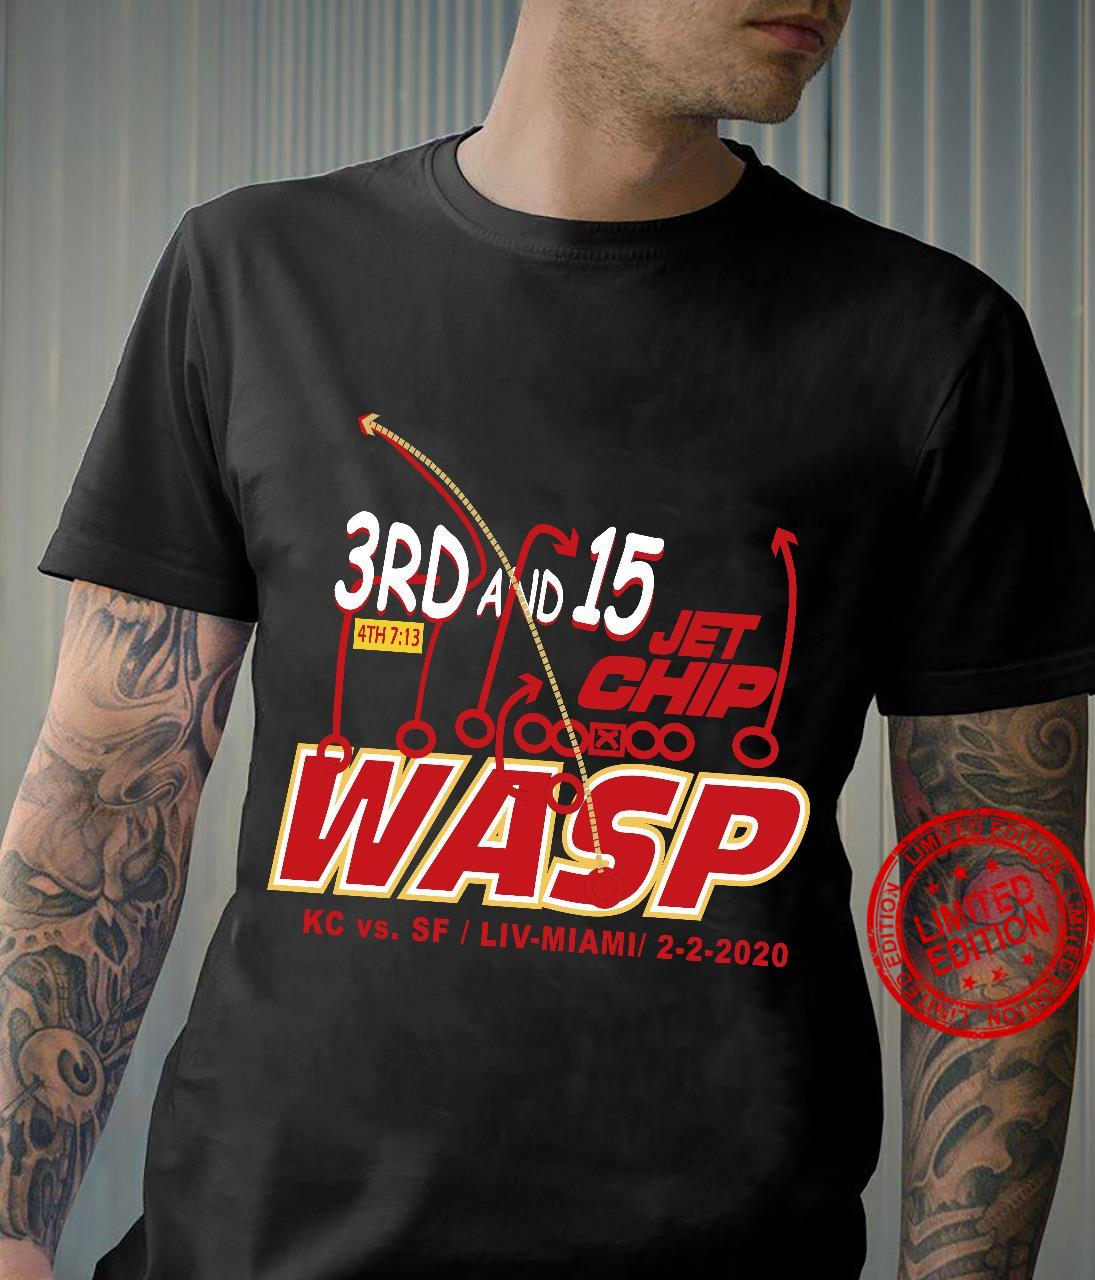 3rd and 15 jet chip WASP KC vs SF Liv-Miami shirt